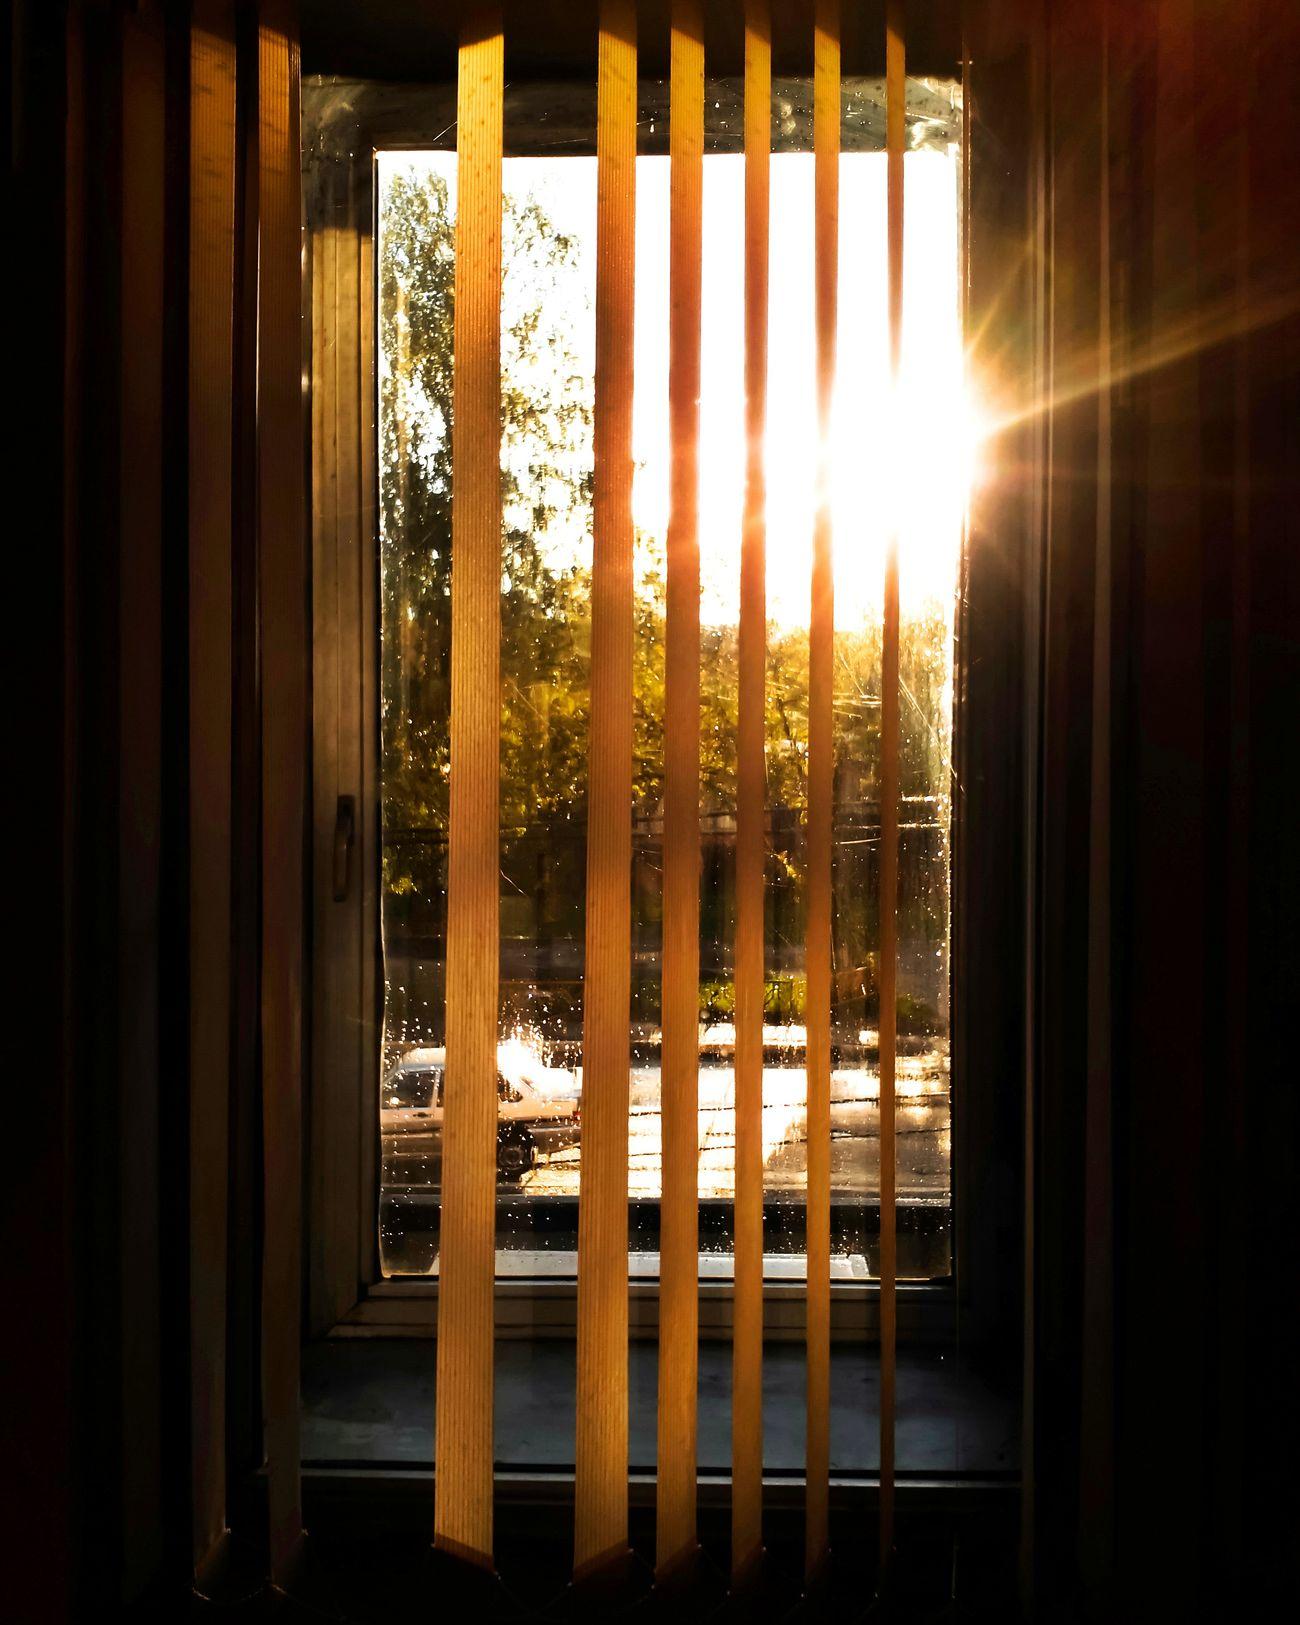 There's the last sunset of spring. Sergey Diploidrec BeardMan ♡♡ EyeEm Best Shots MyLove❤ Stillinlovewithyou  Window Jalousie Window Jalousie Sunsets Sunlight ☀ Sunsetwindow